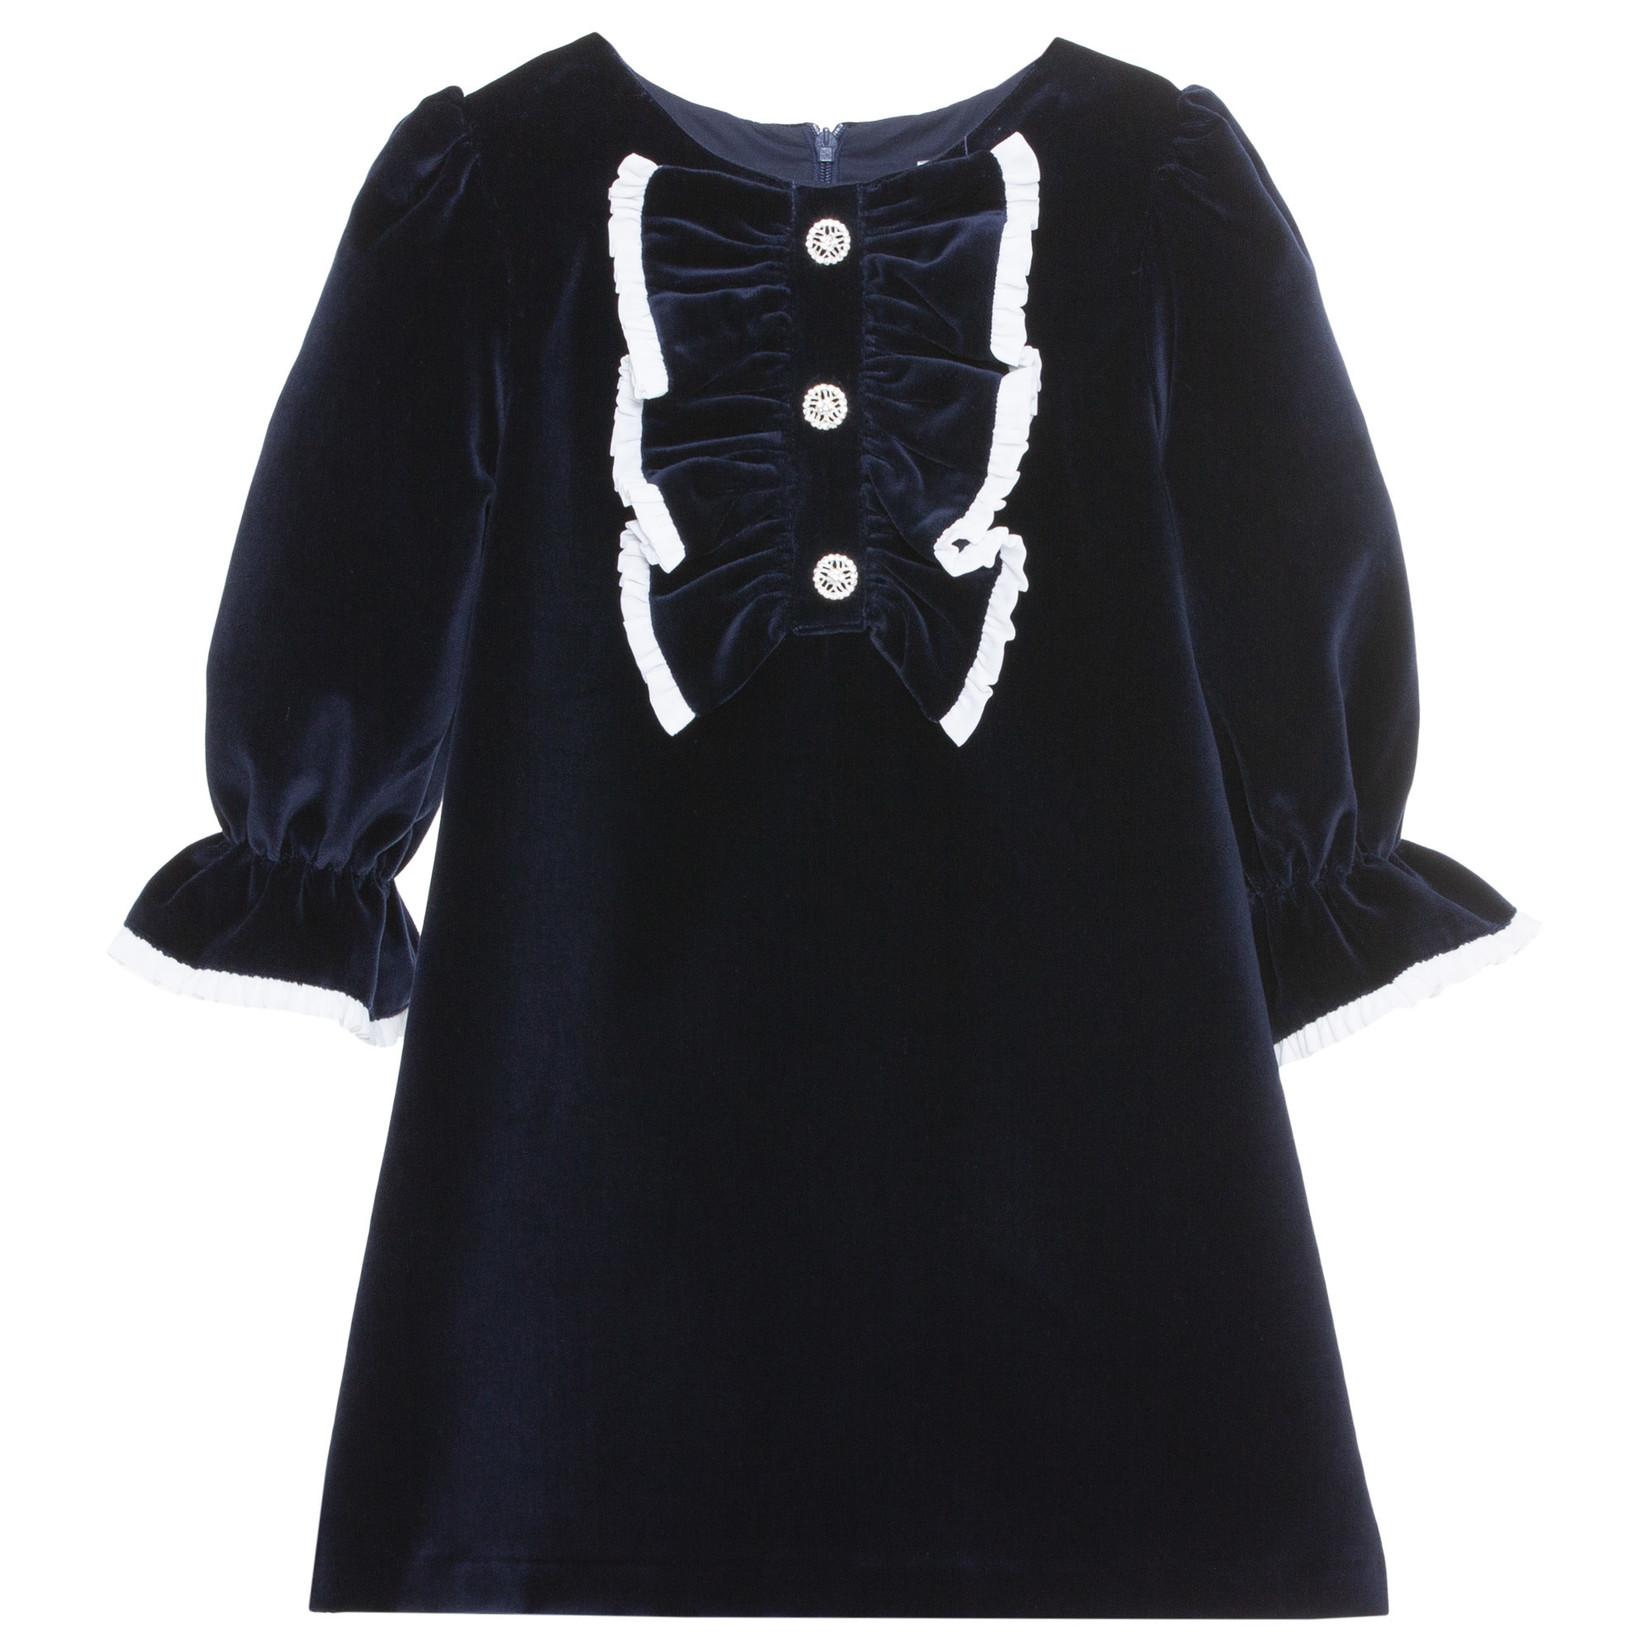 Patachou Dress Special - Patachou